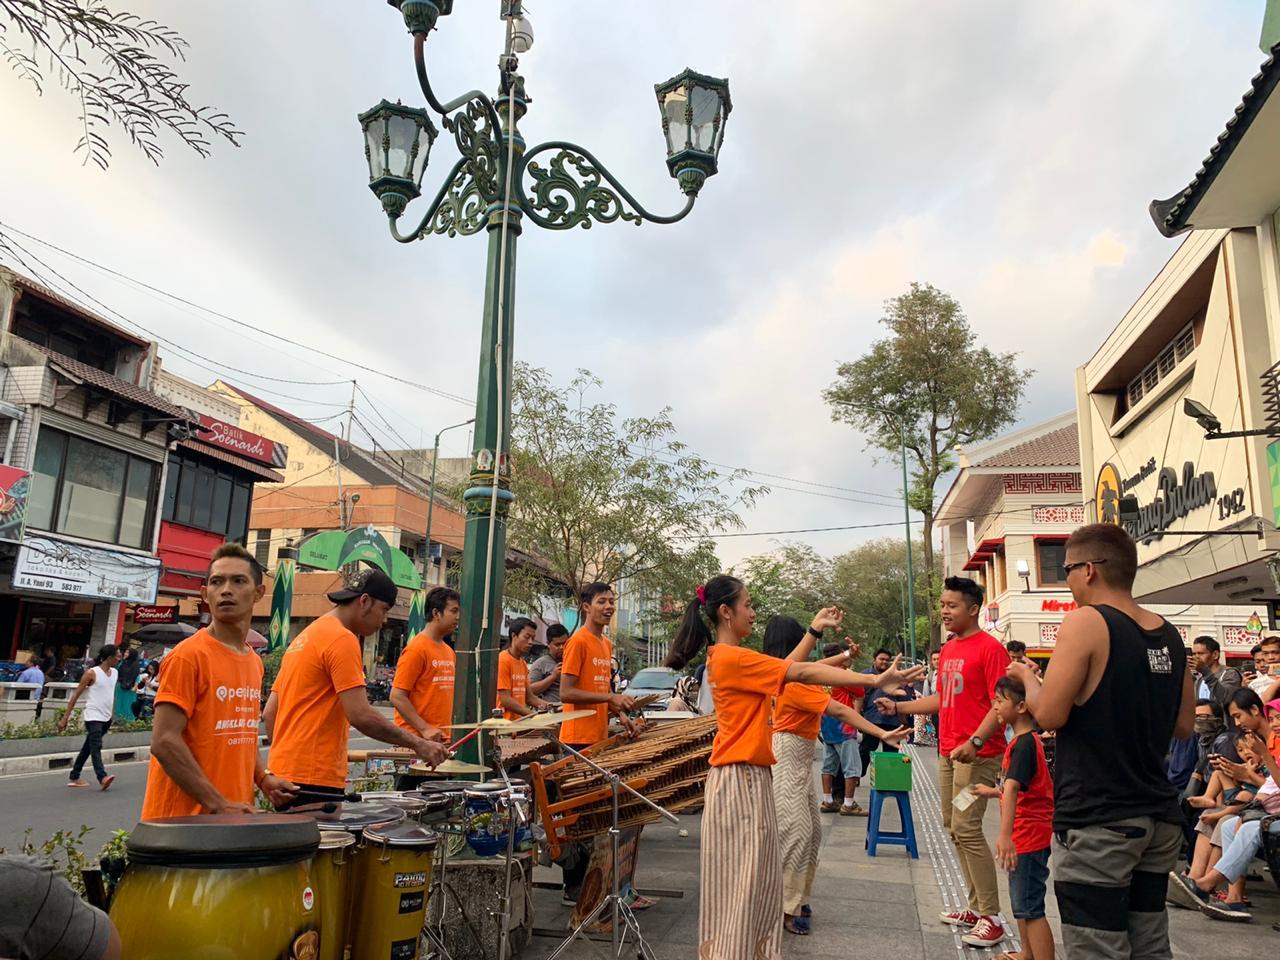 Kemenparekraf Fasilitasi Musisi Jalanan Terdampak COVID-19 Manggung Online